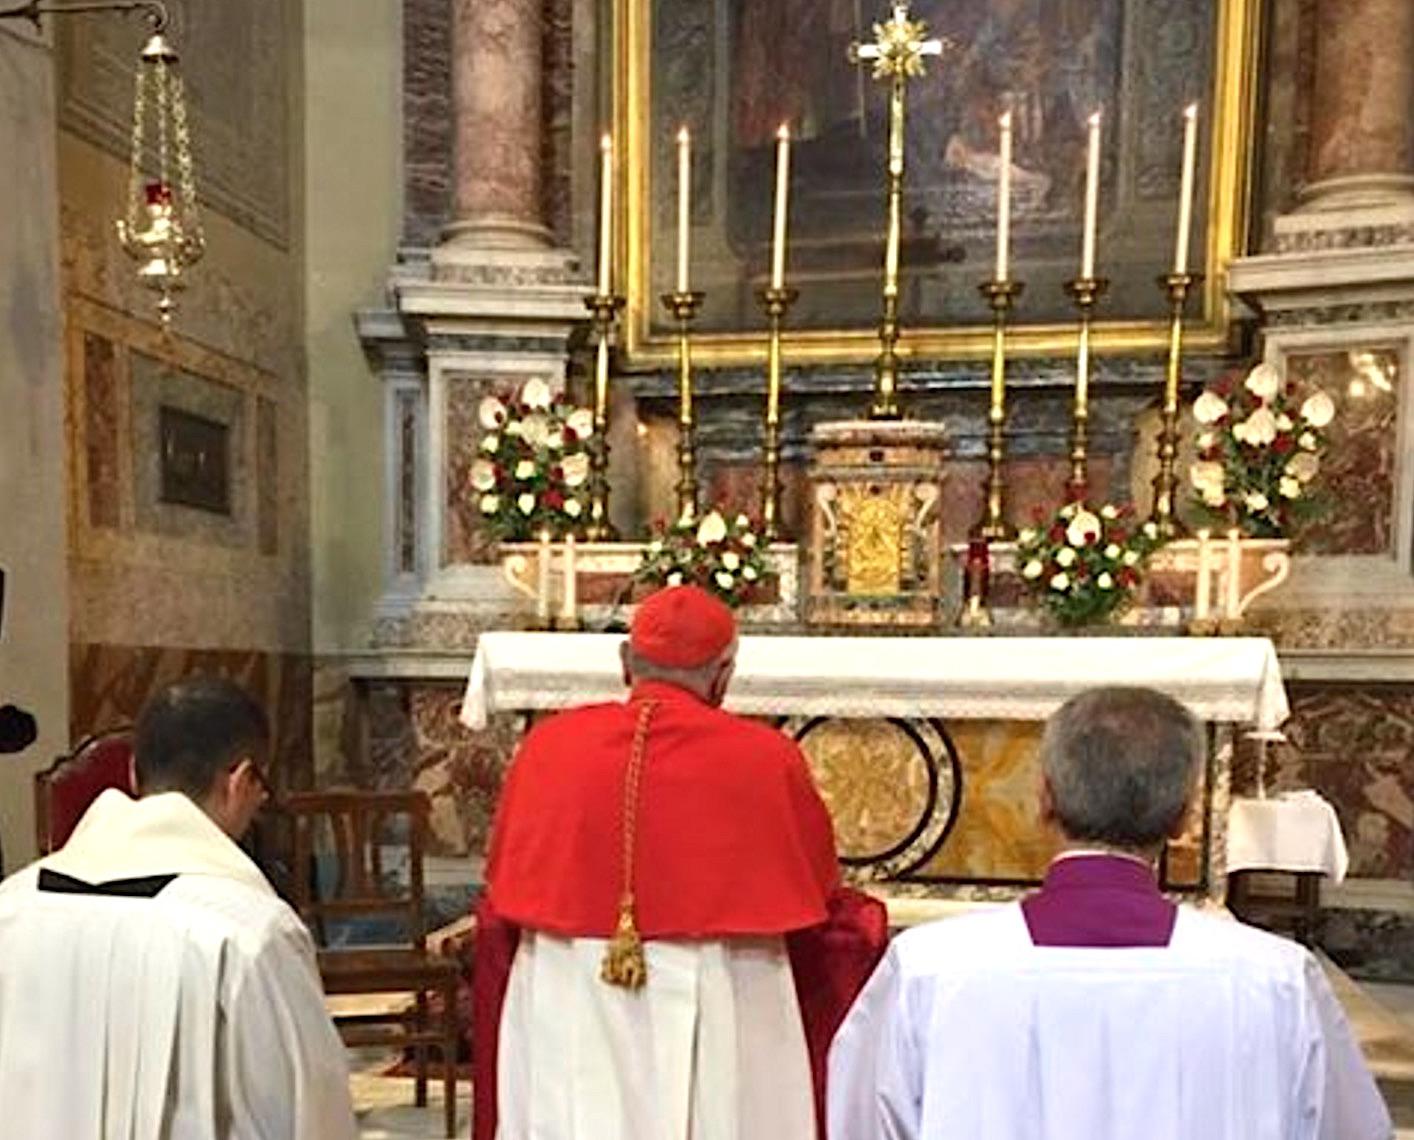 El cardenal Porras toma posesión de su iglesia en Roma